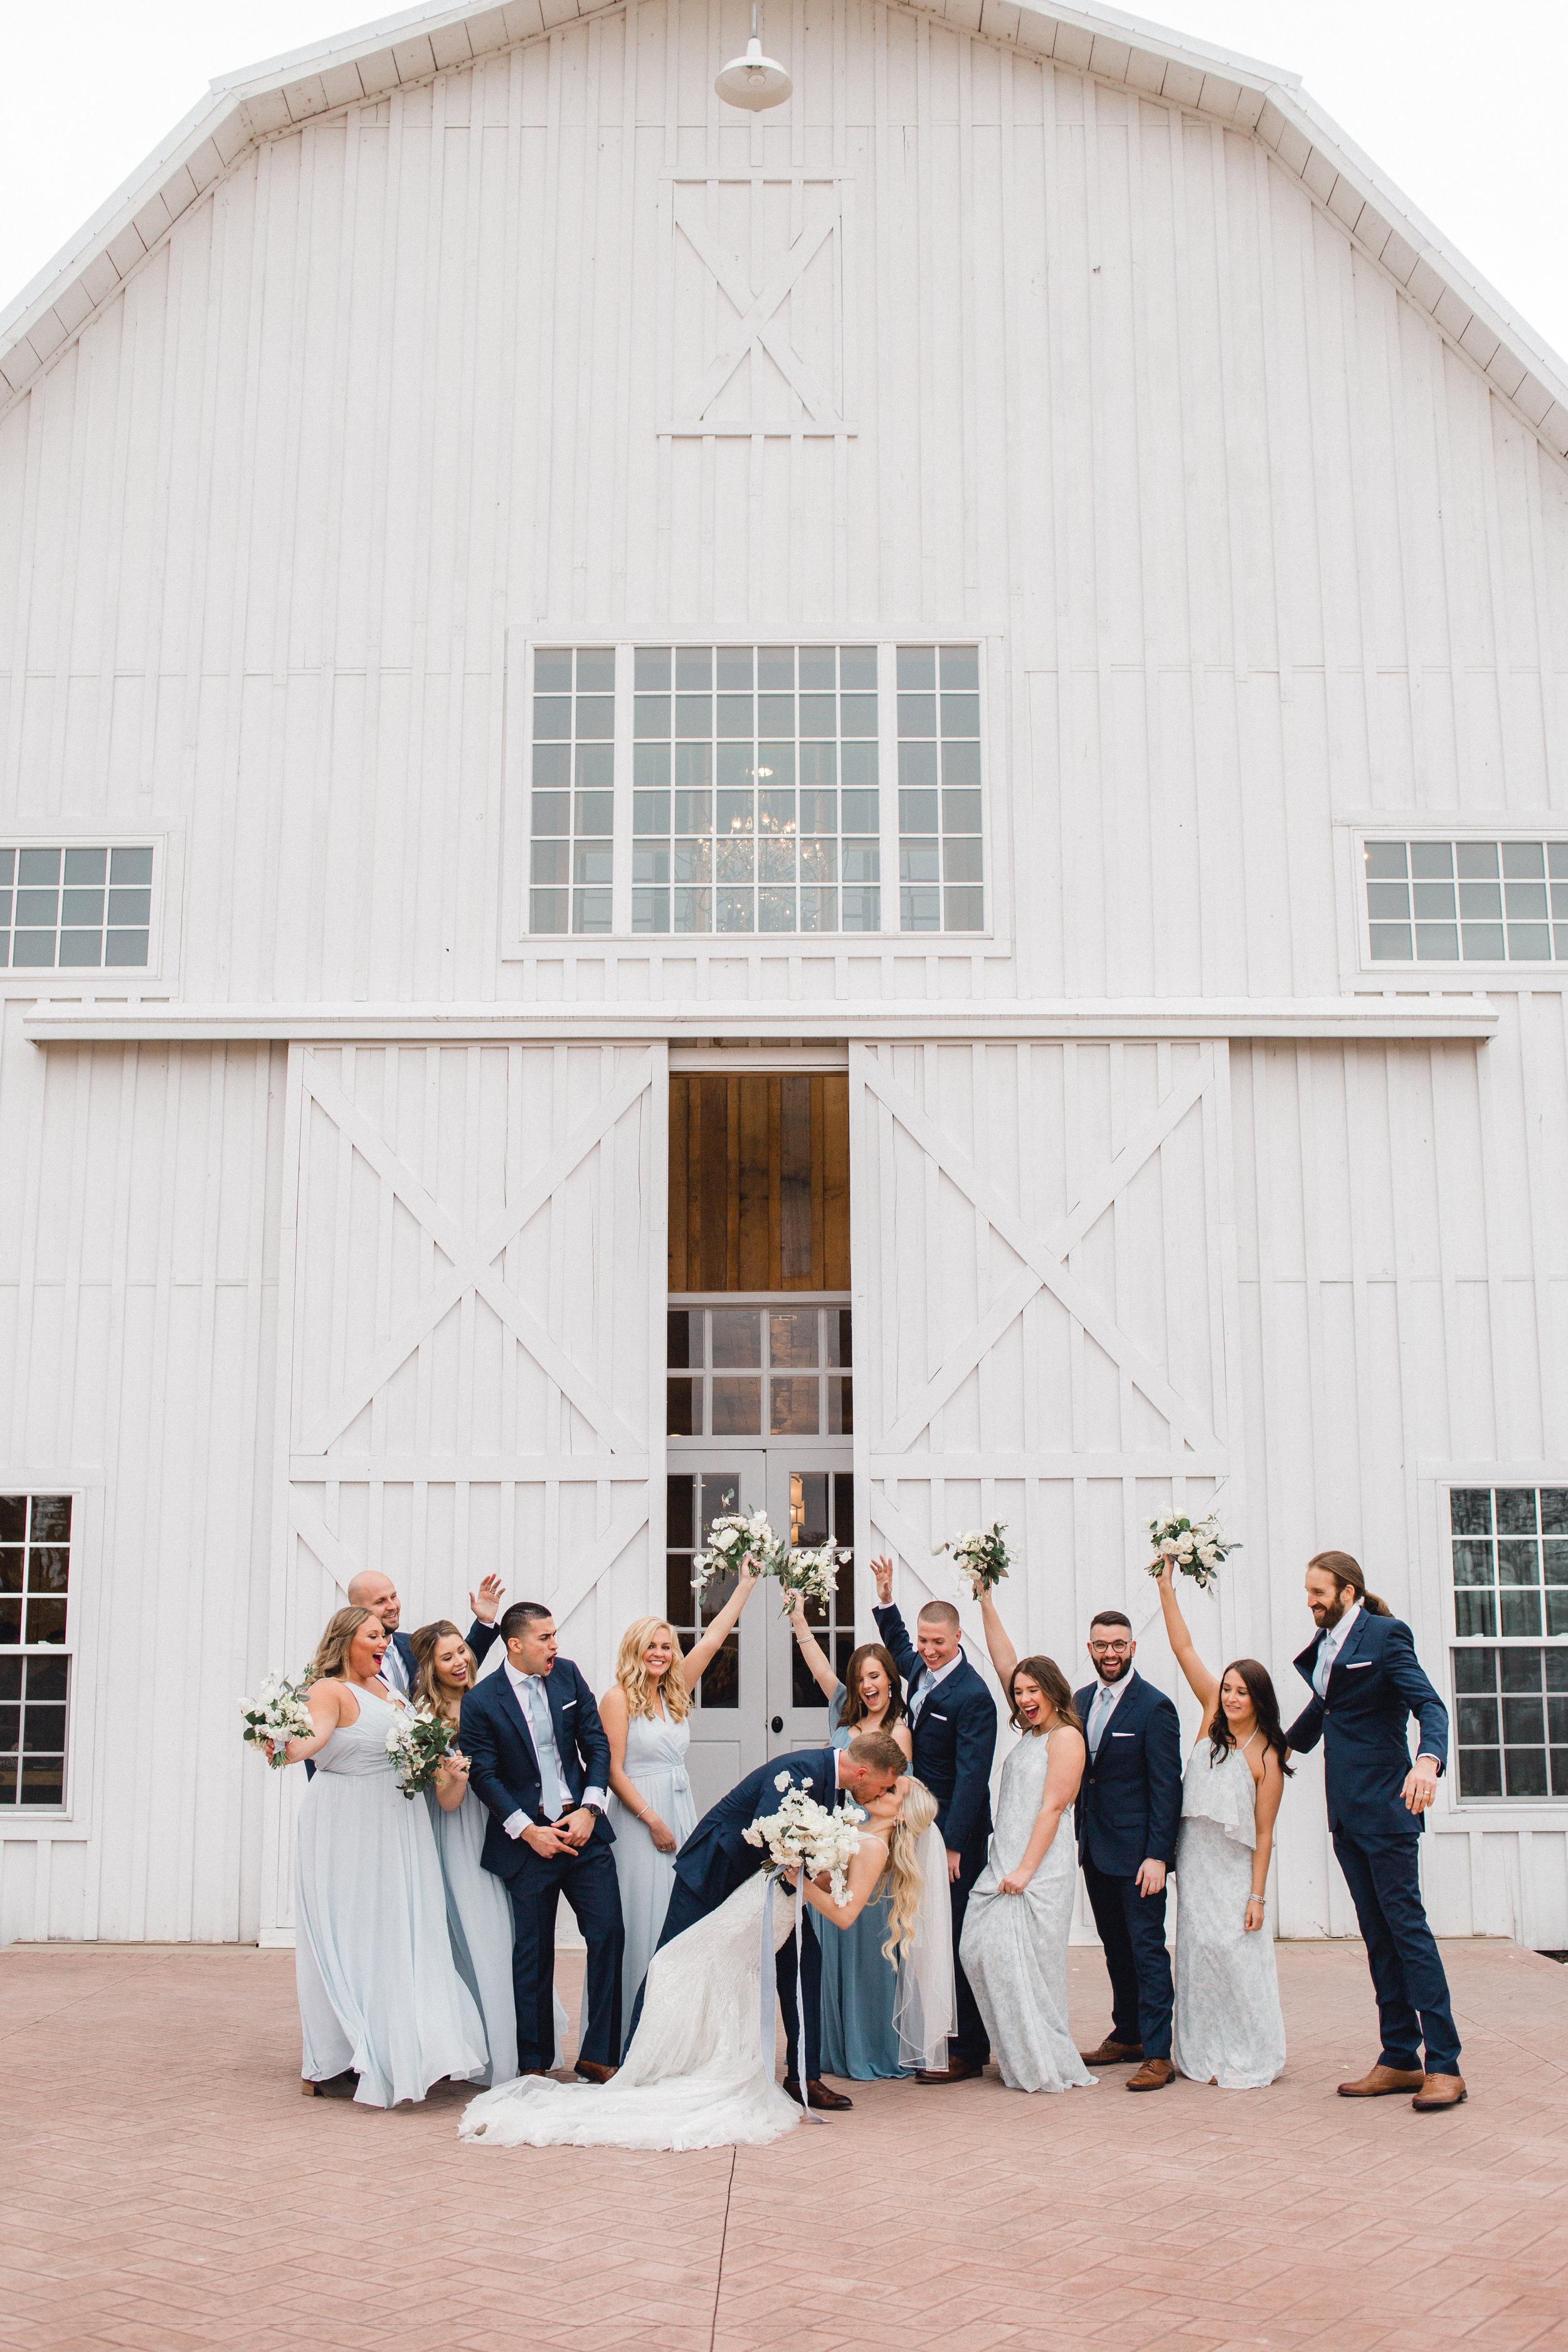 Chloe+Austin Wedding_550.JPG